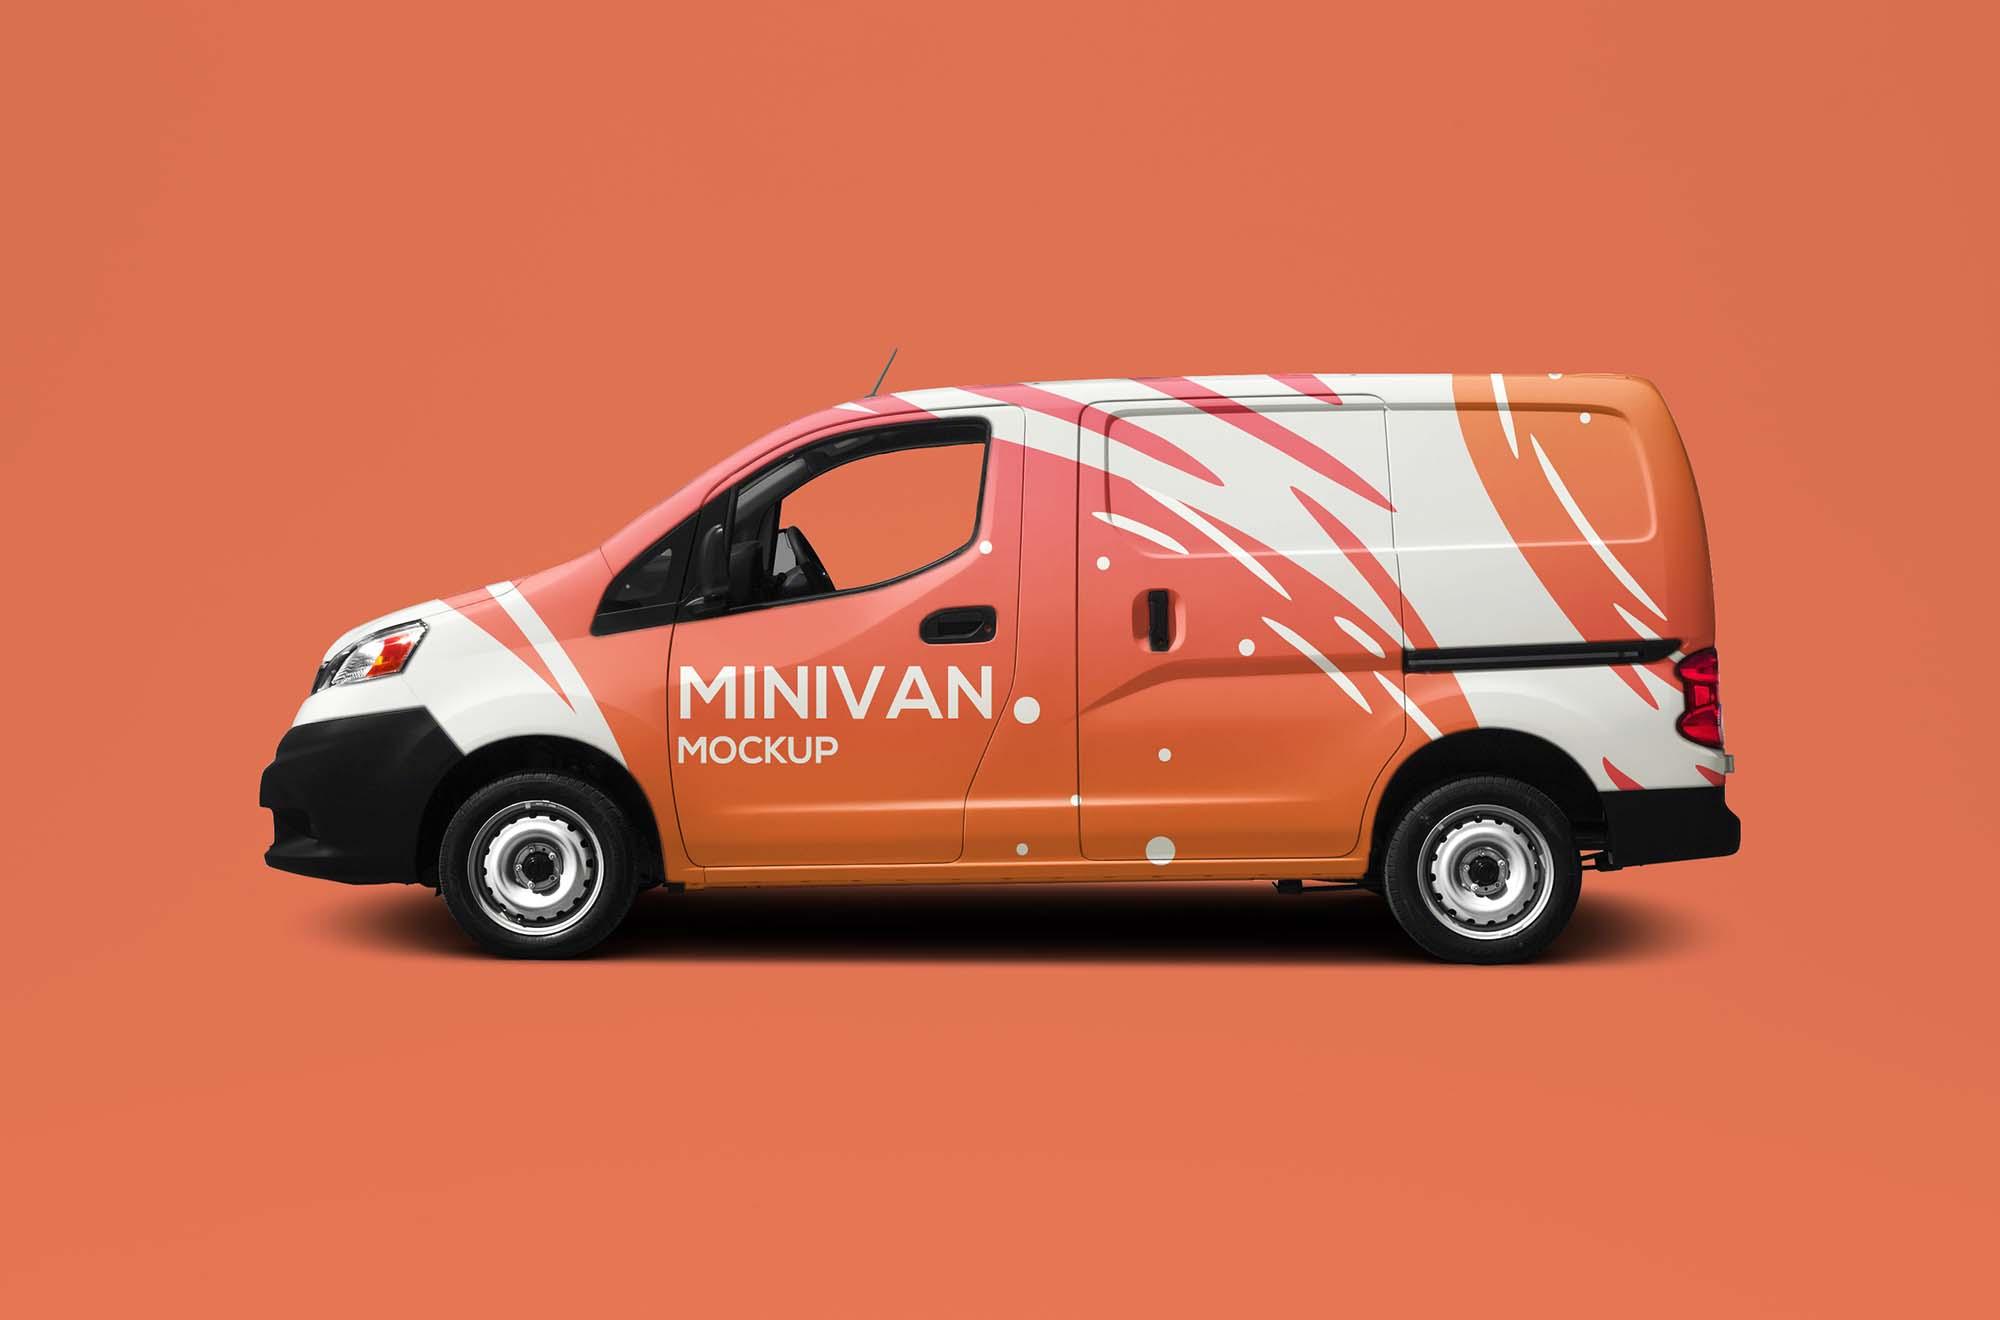 Minivan Mockup 2